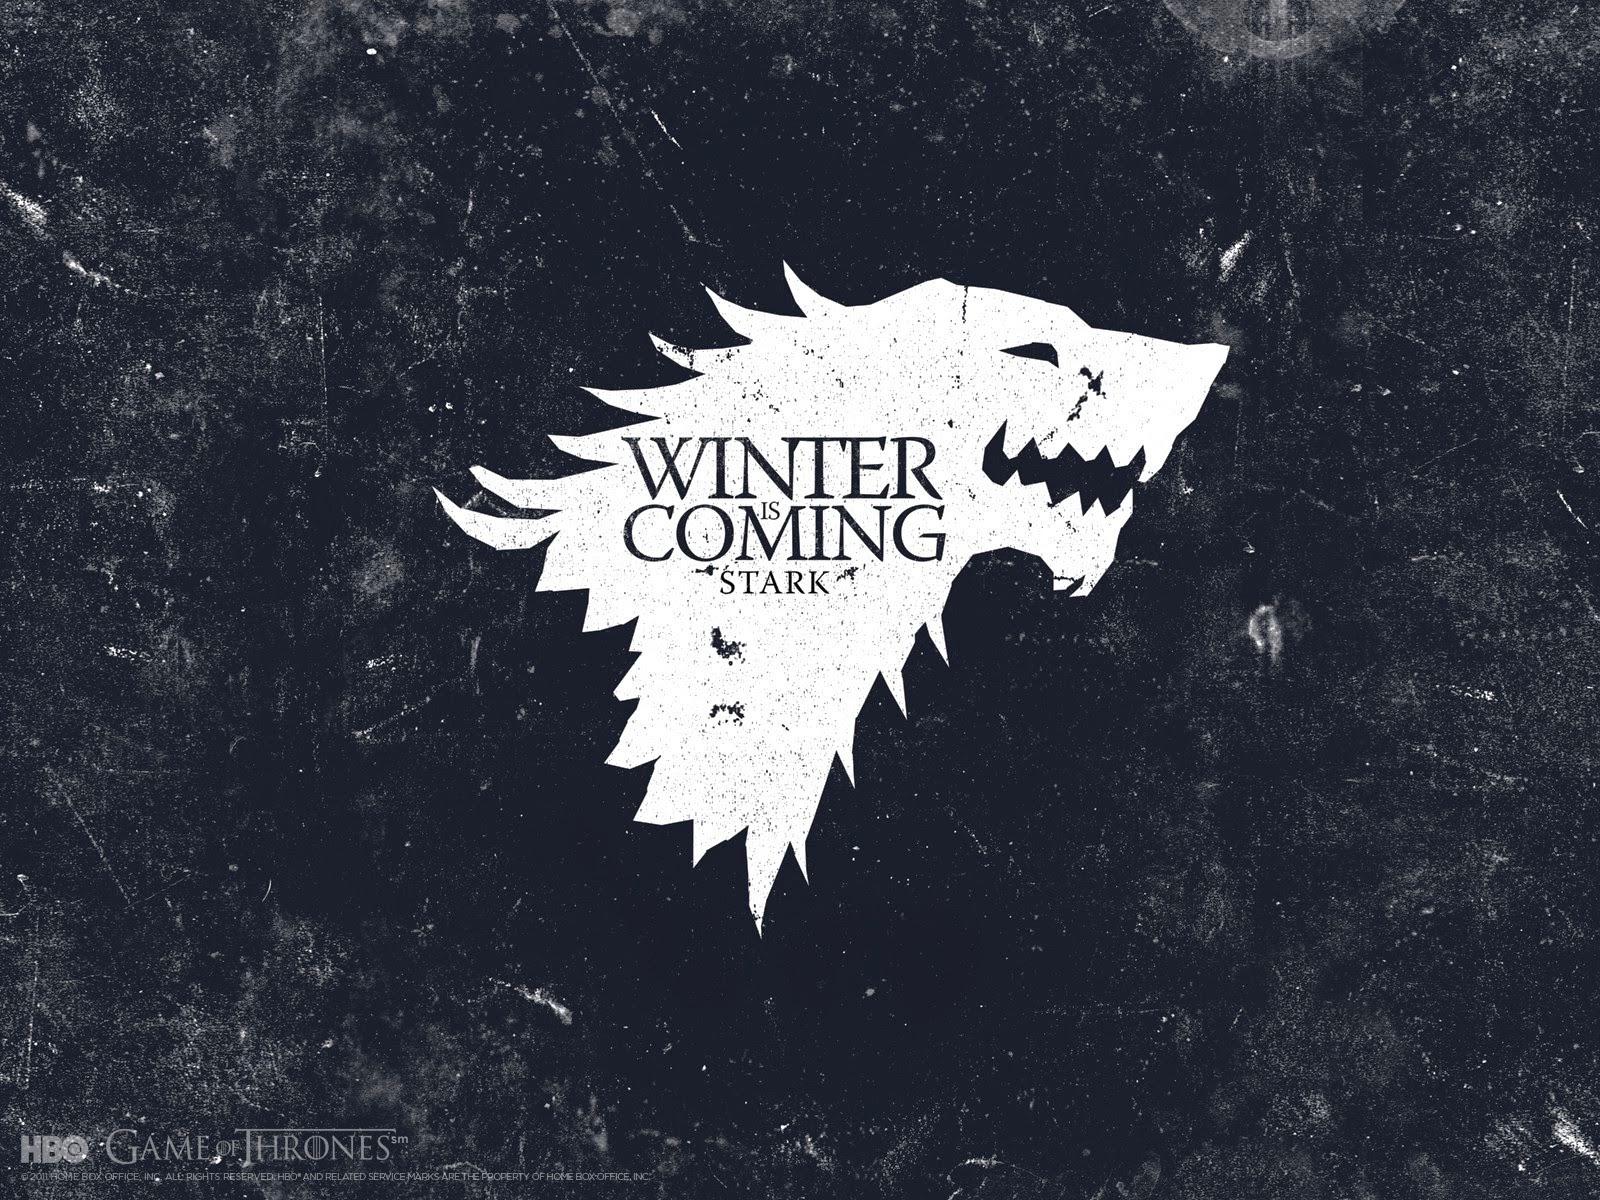 Casa Stark!